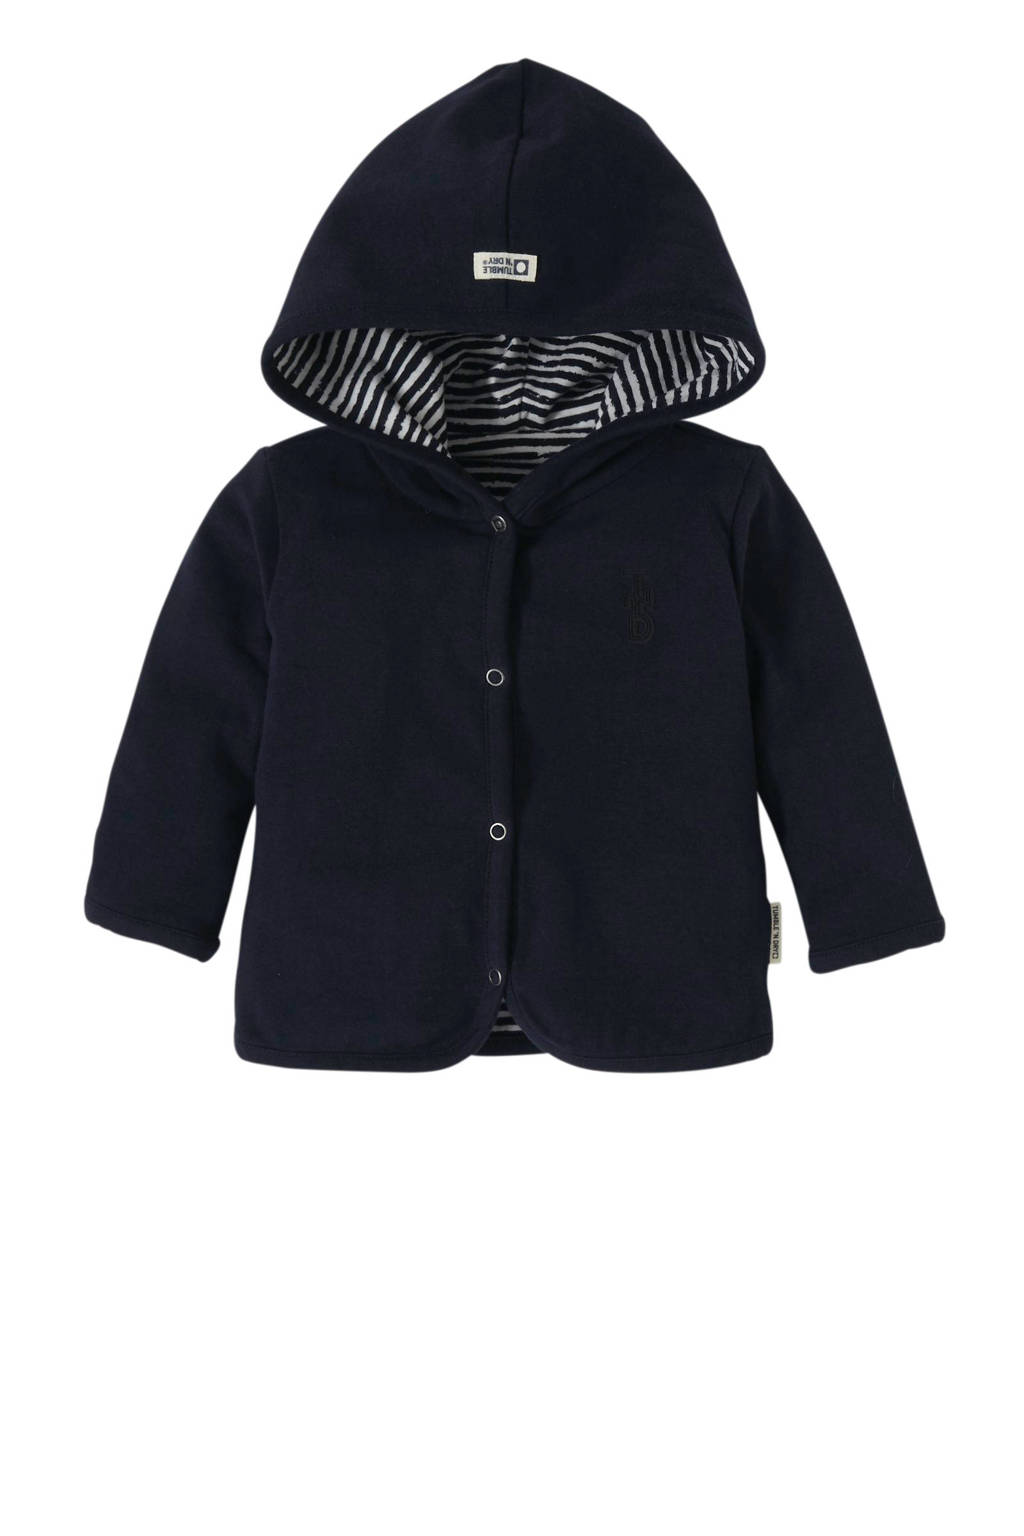 Tumble 'n Dry Zero newborn baby vest Qinn met all over print blauw, Donkerblauw/wit